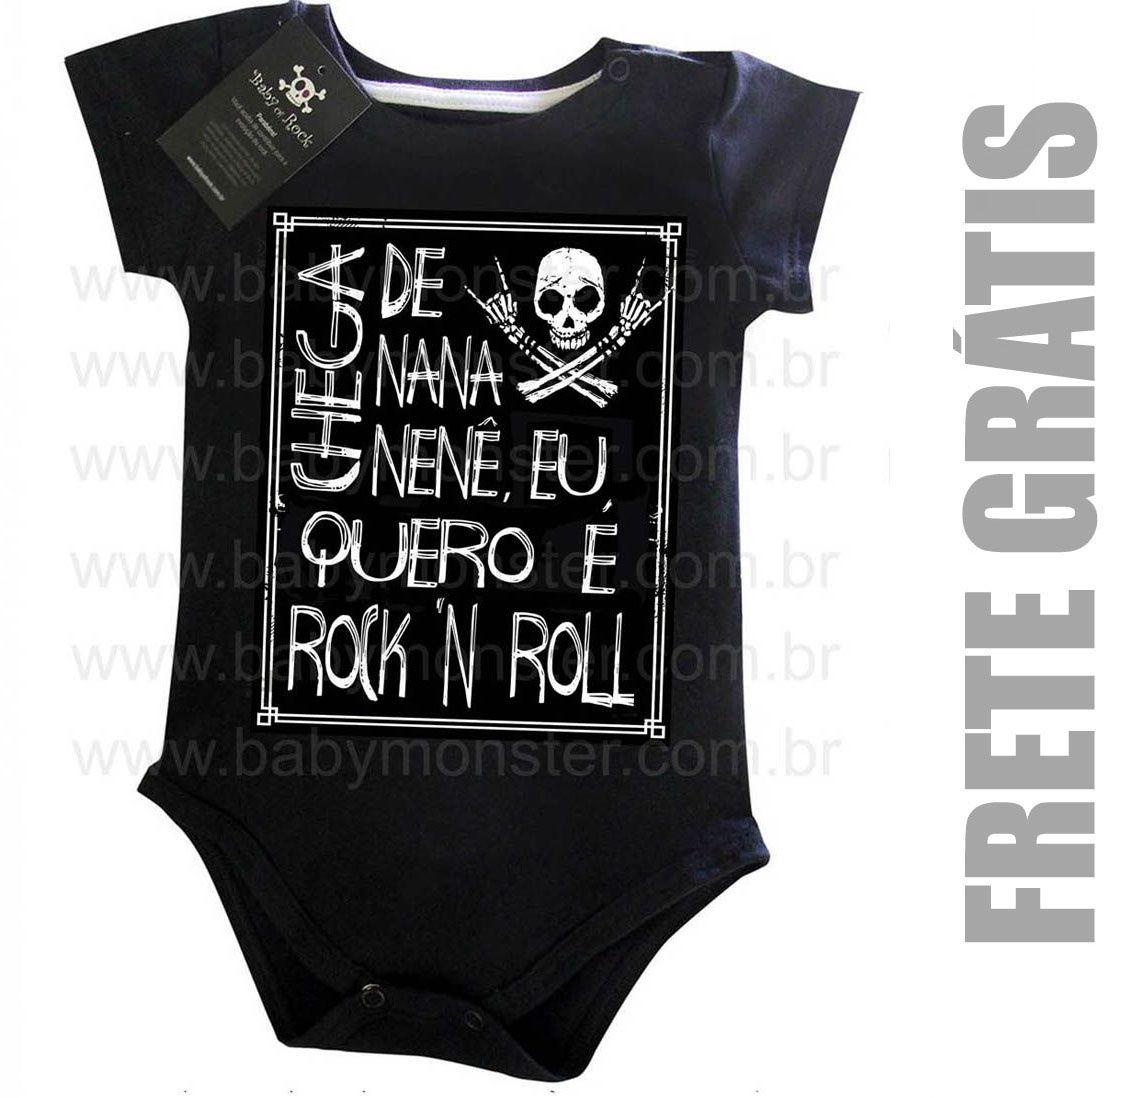 Body Rock Baby - Chega de Nana Neném Black  - Baby Monster S/A